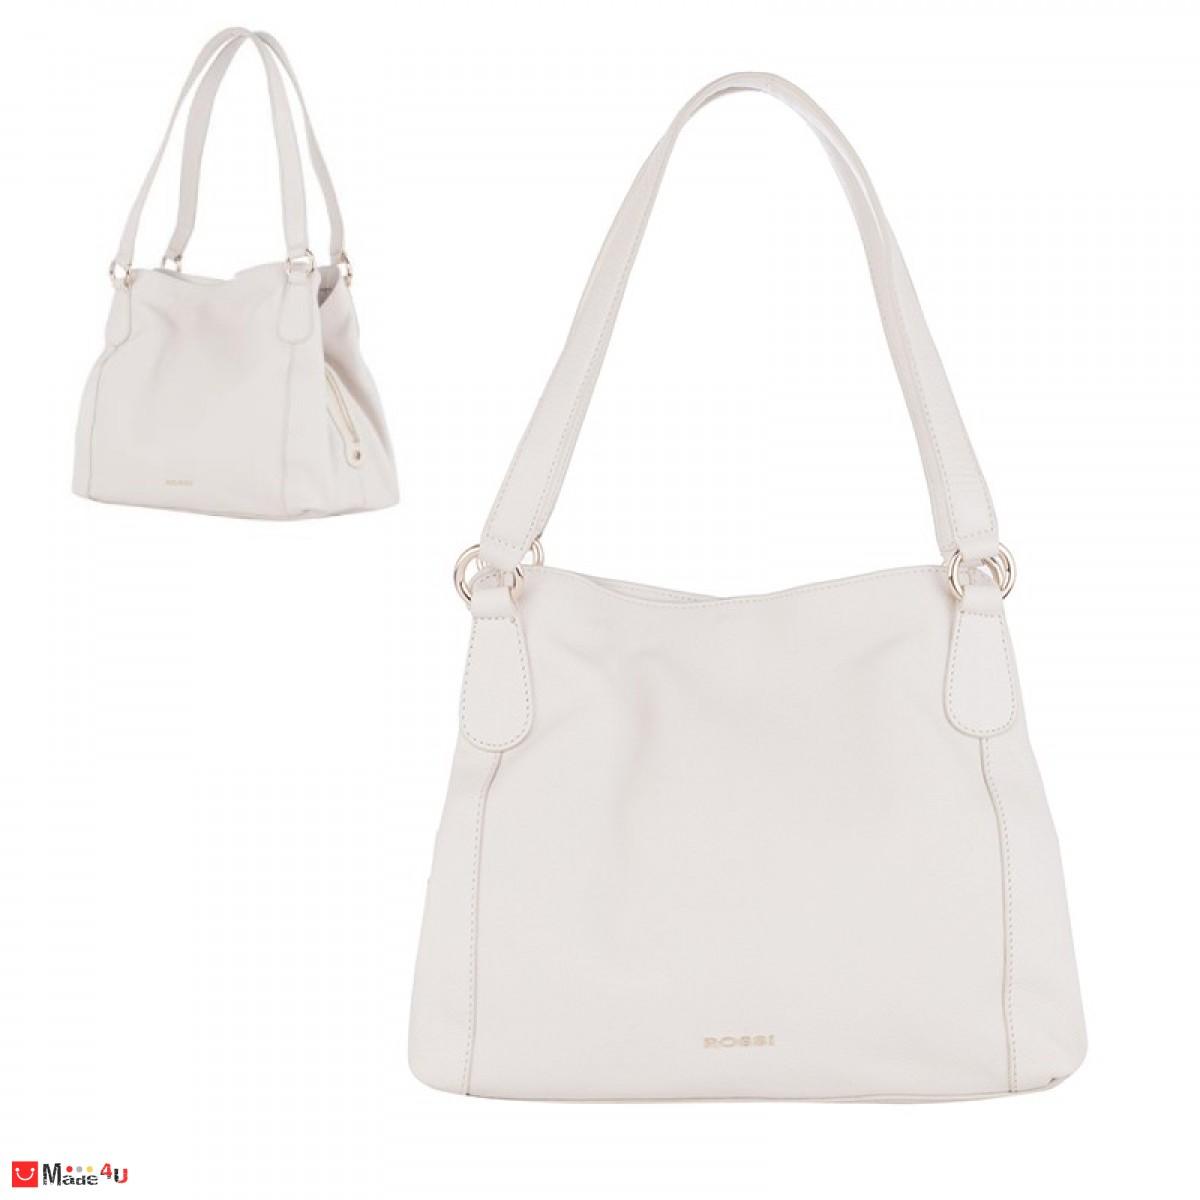 Дамска чанта естествена кожа 21х40см, слонова кост